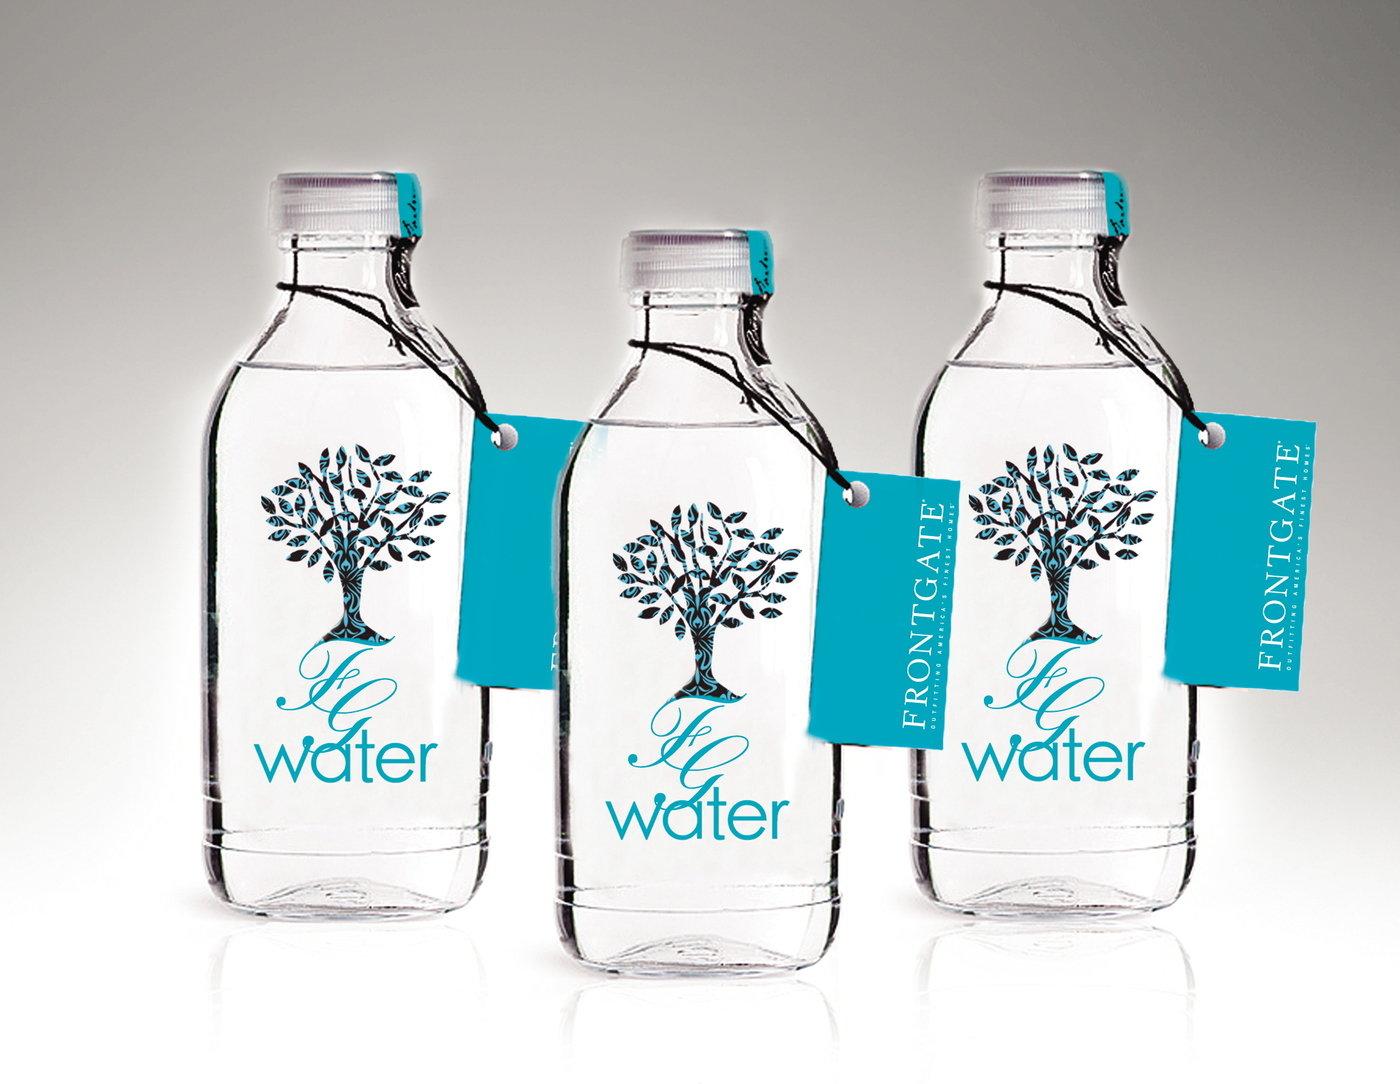 water bottles by olga cuzuioc sinchevici at coroflot com